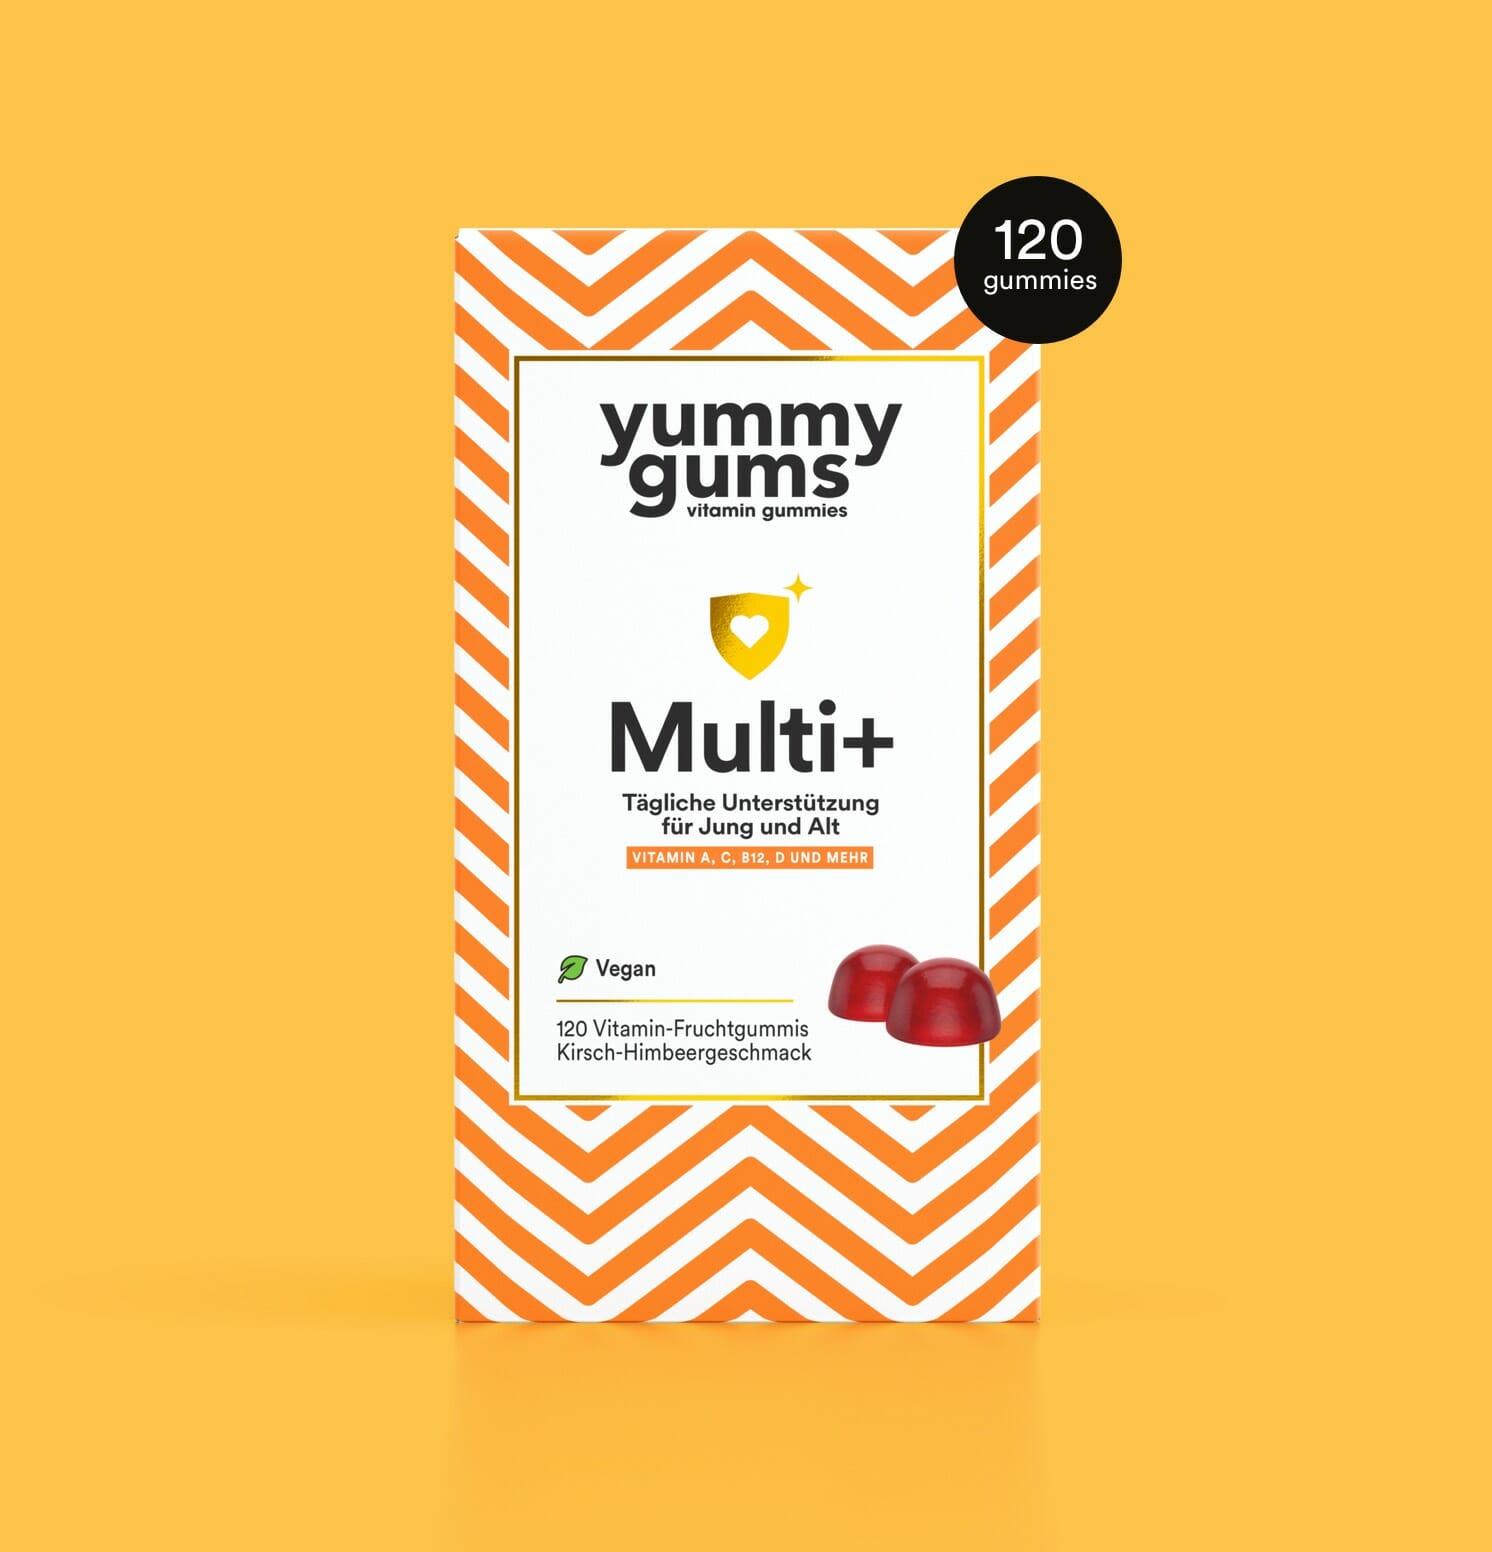 Bestes Multivitamin - Multivitamin Frau - Multivitamin Mann - Yummygums